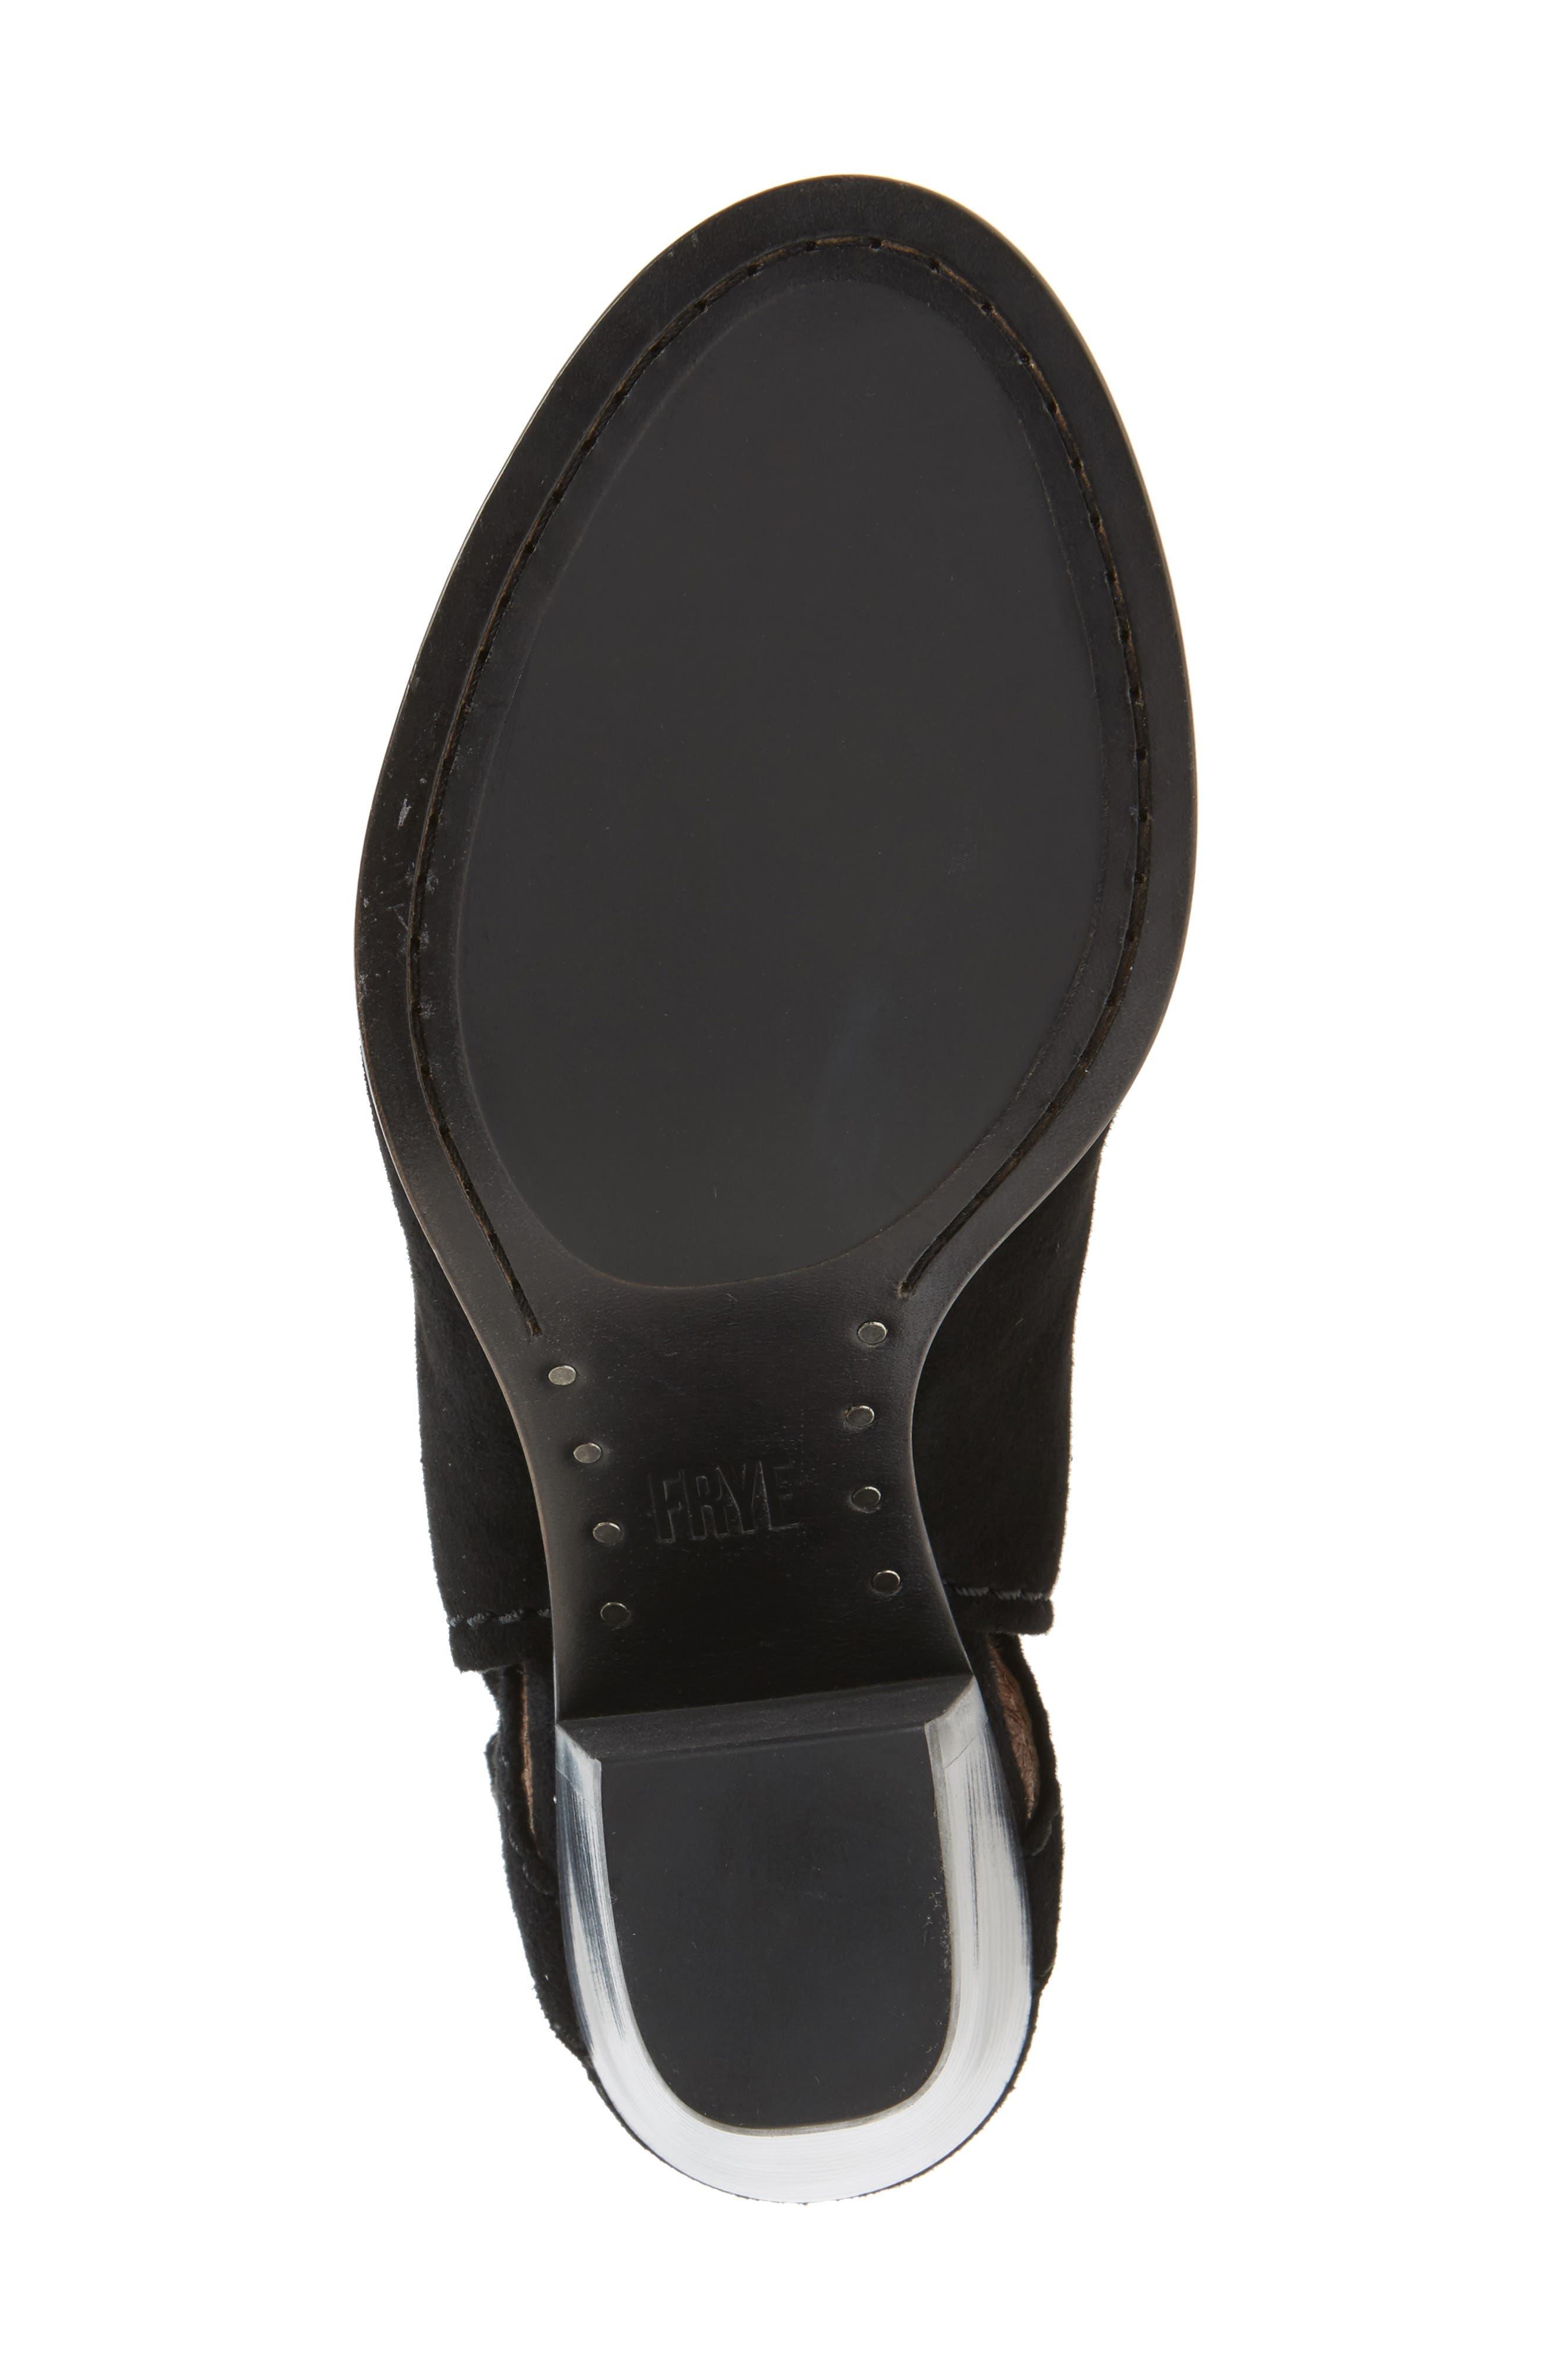 FRYE,                             'Dani Shield' Sandal,                             Alternate thumbnail 4, color,                             001